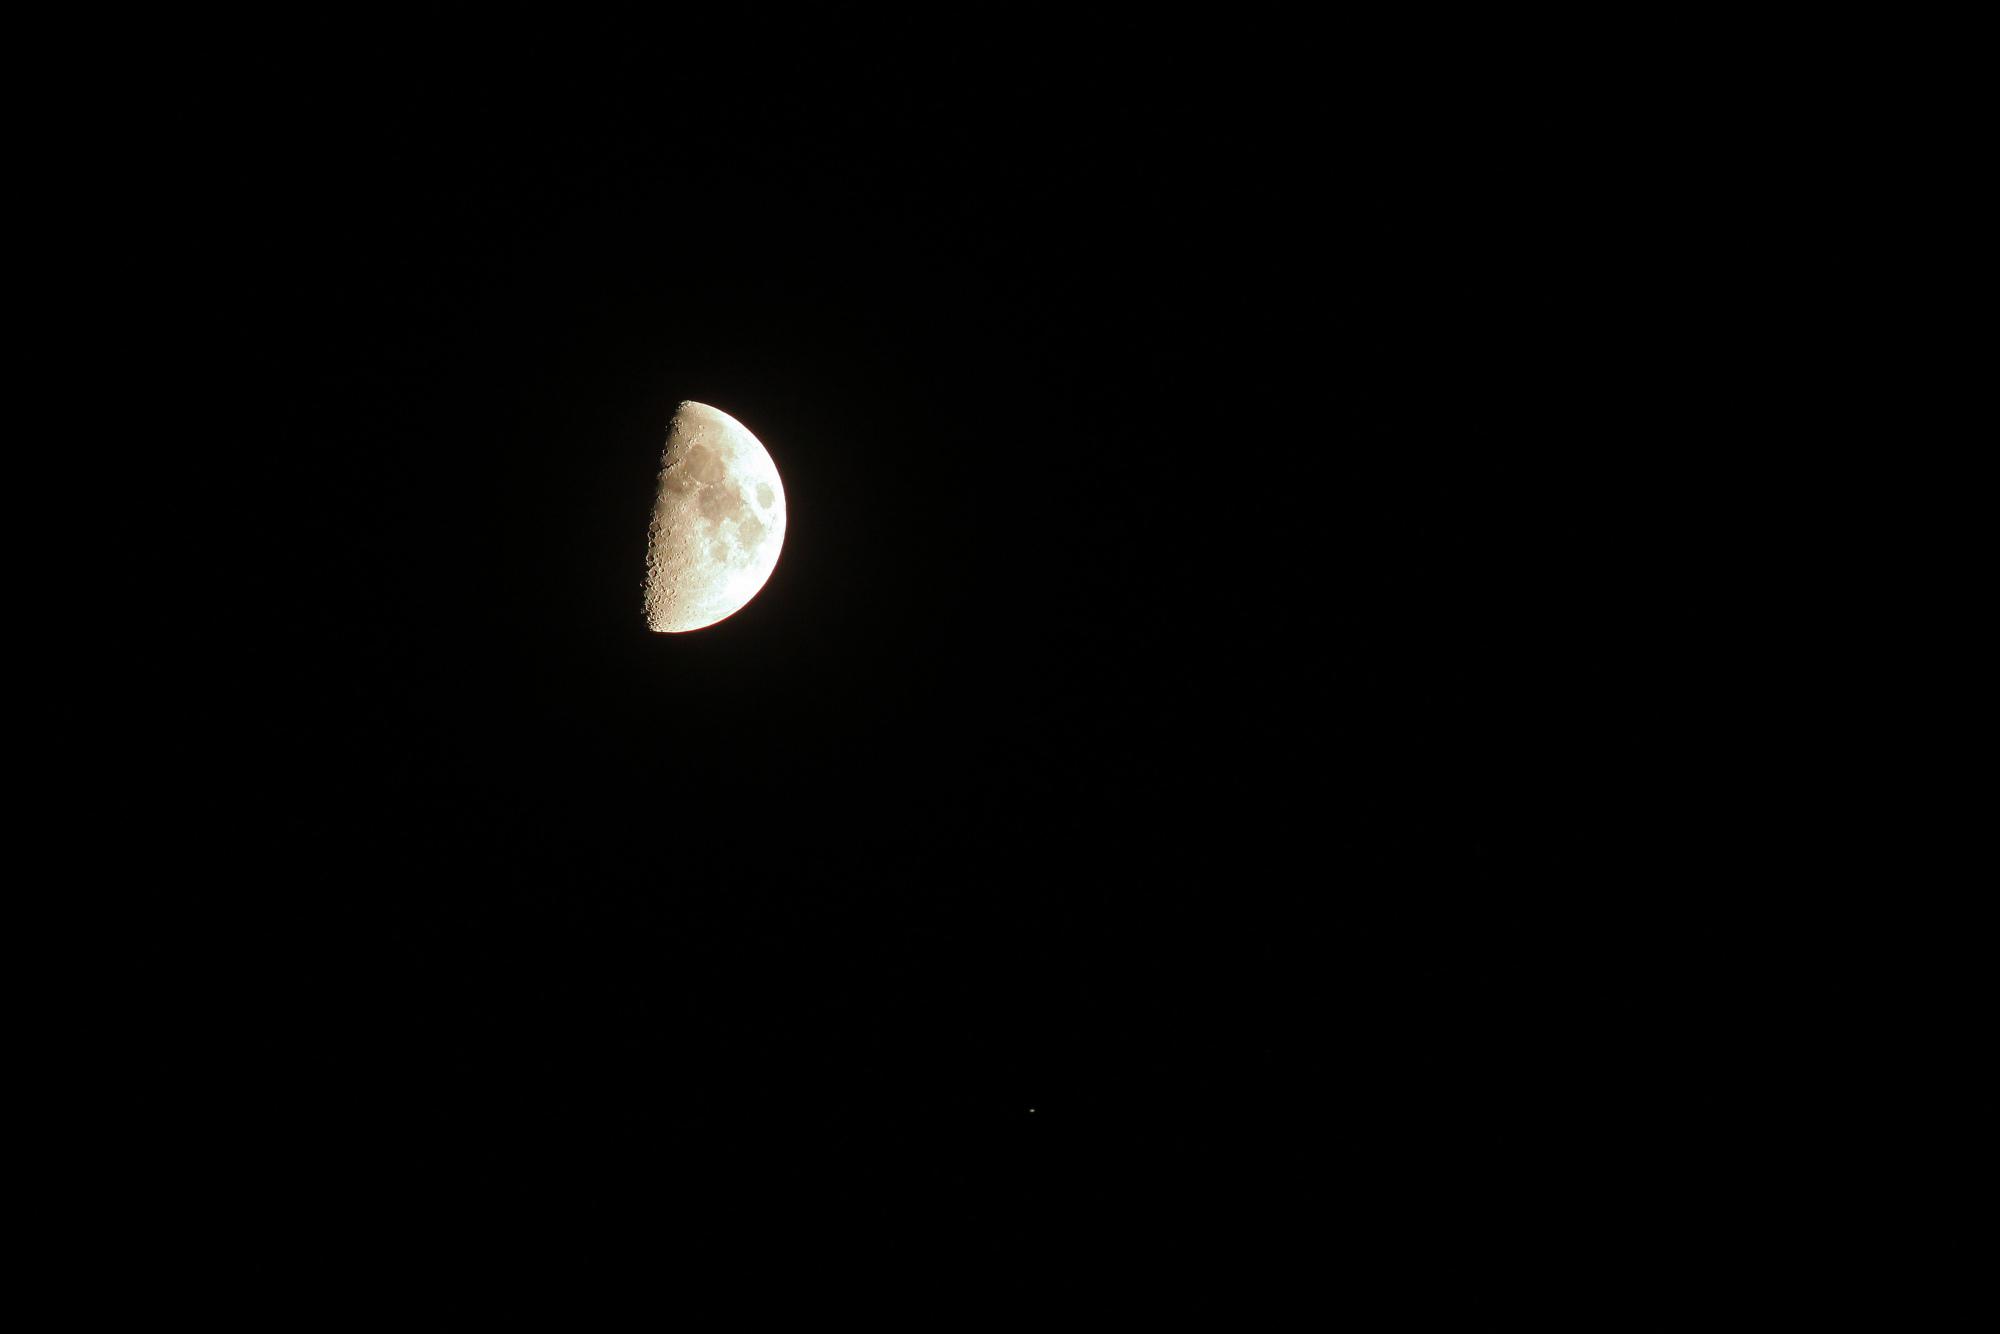 5ba13c42abde9_lune-saturne300mmfinish.thumb.jpg.4adf472e3e14f6a13f53b031c250210a.jpg